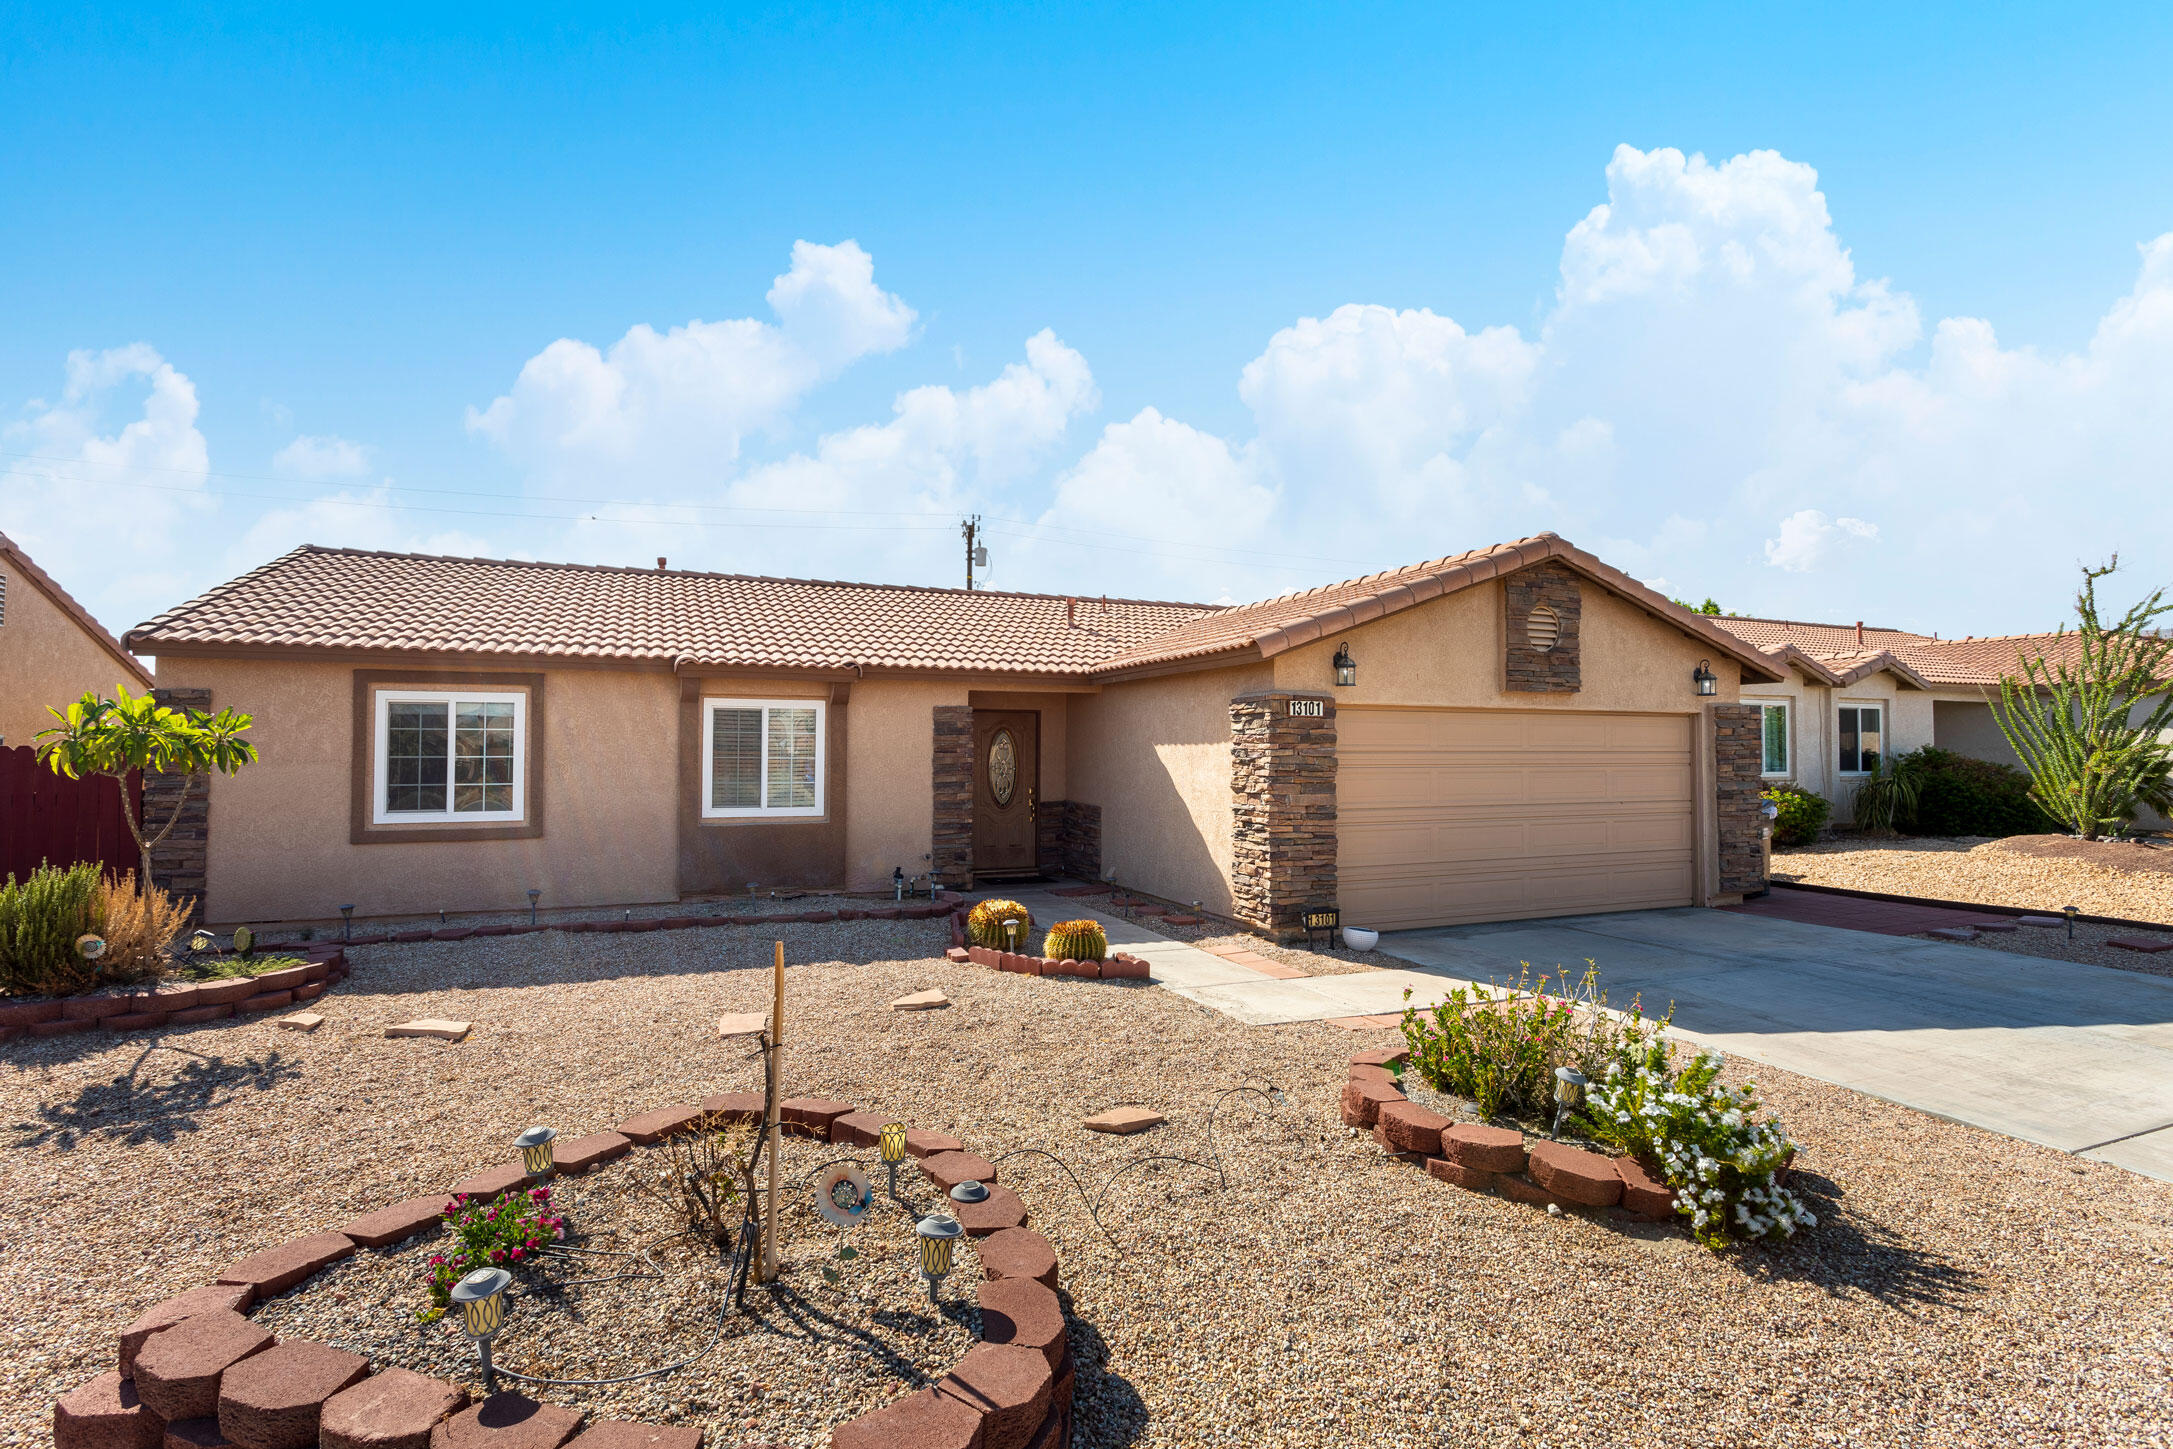 Photo of 13101 Via Real, Desert Hot Springs, CA 92240